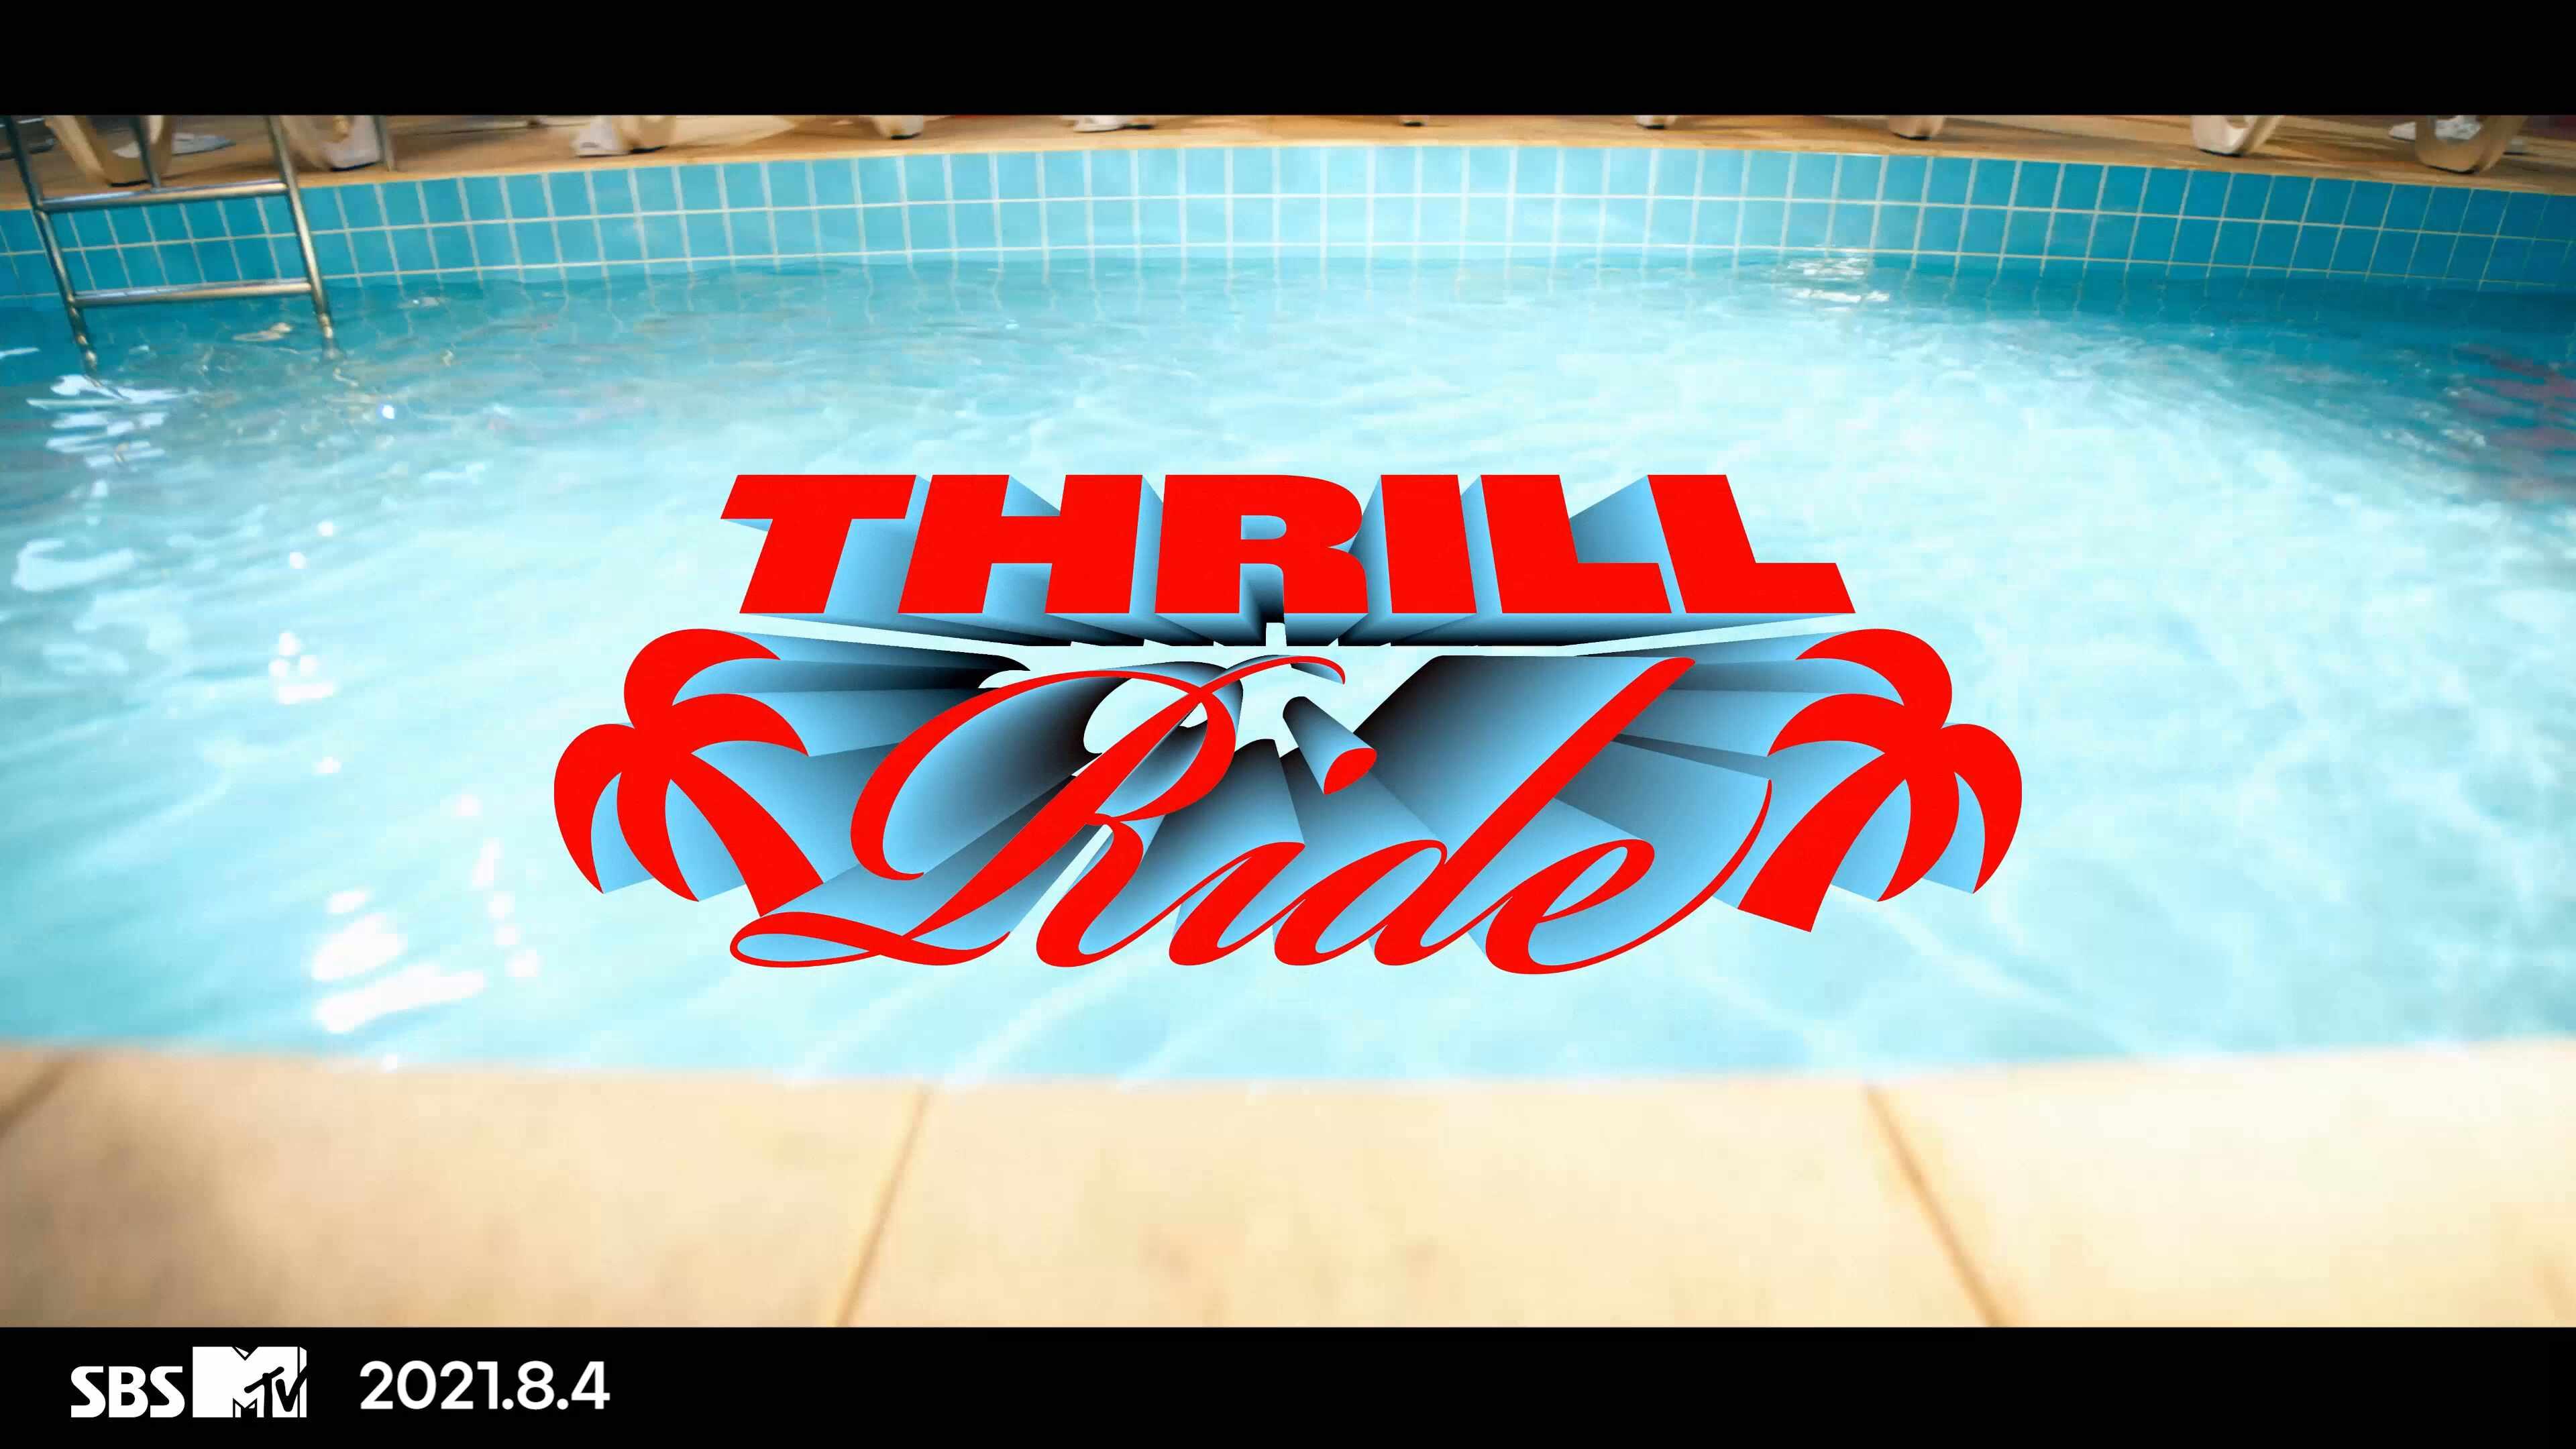 THE BOYZ(더보이즈) 'THRILL RIDE' MV